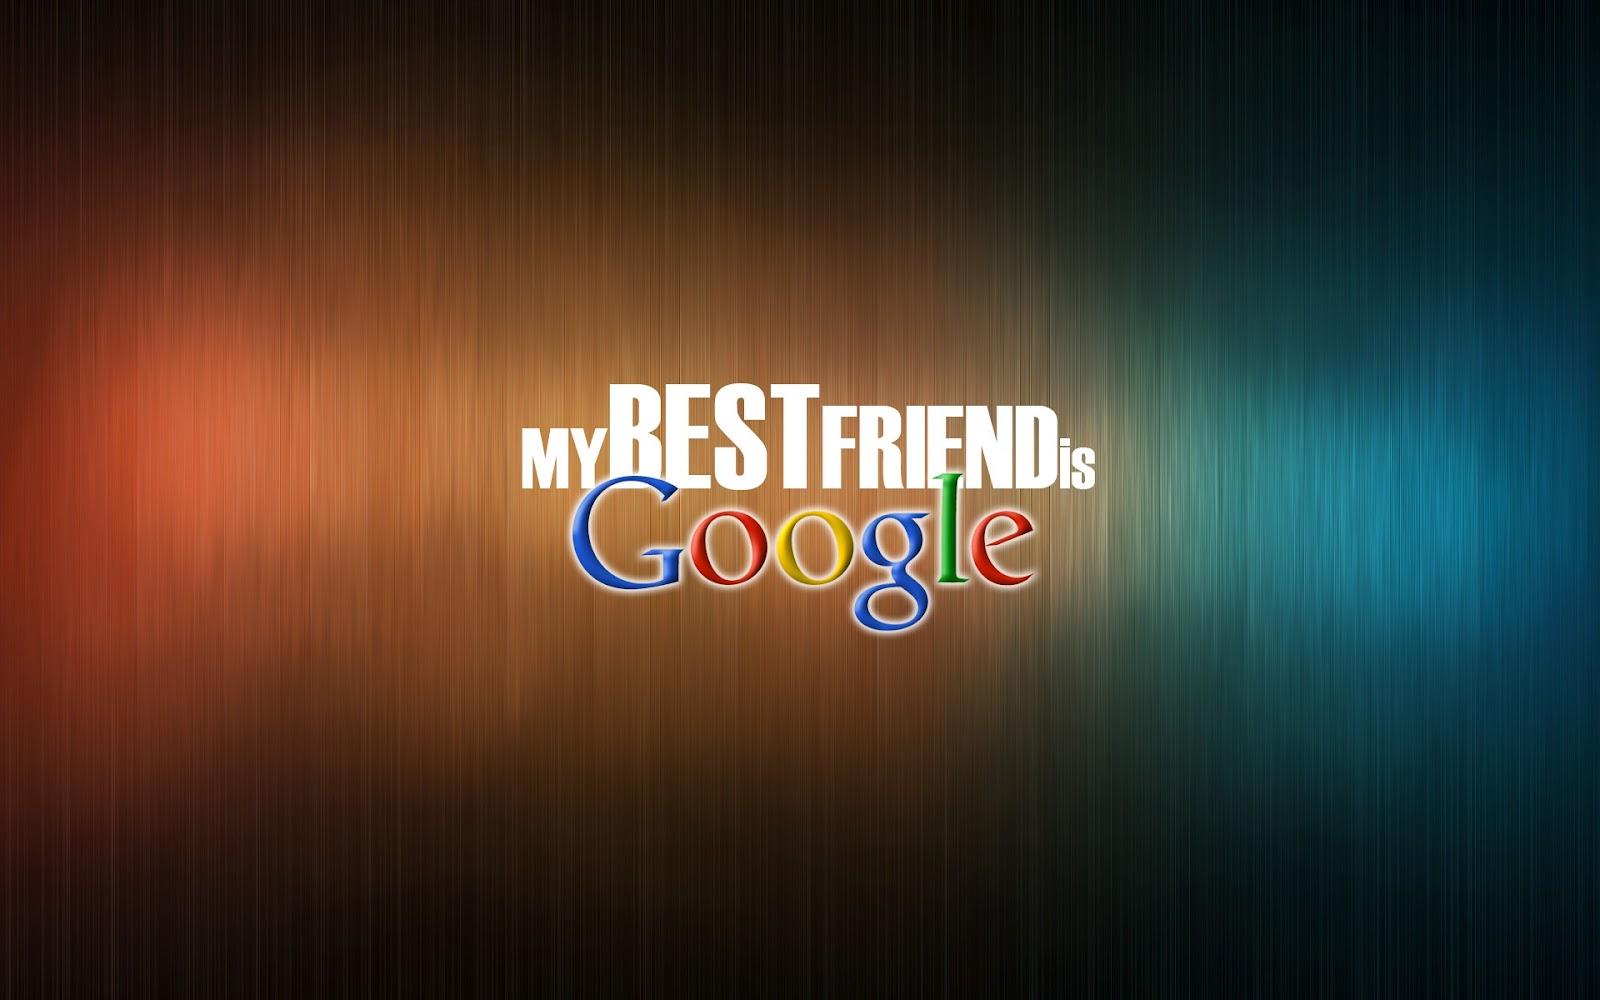 Best Friends Wallpapers For Facebook My best friend is google 1600x1000